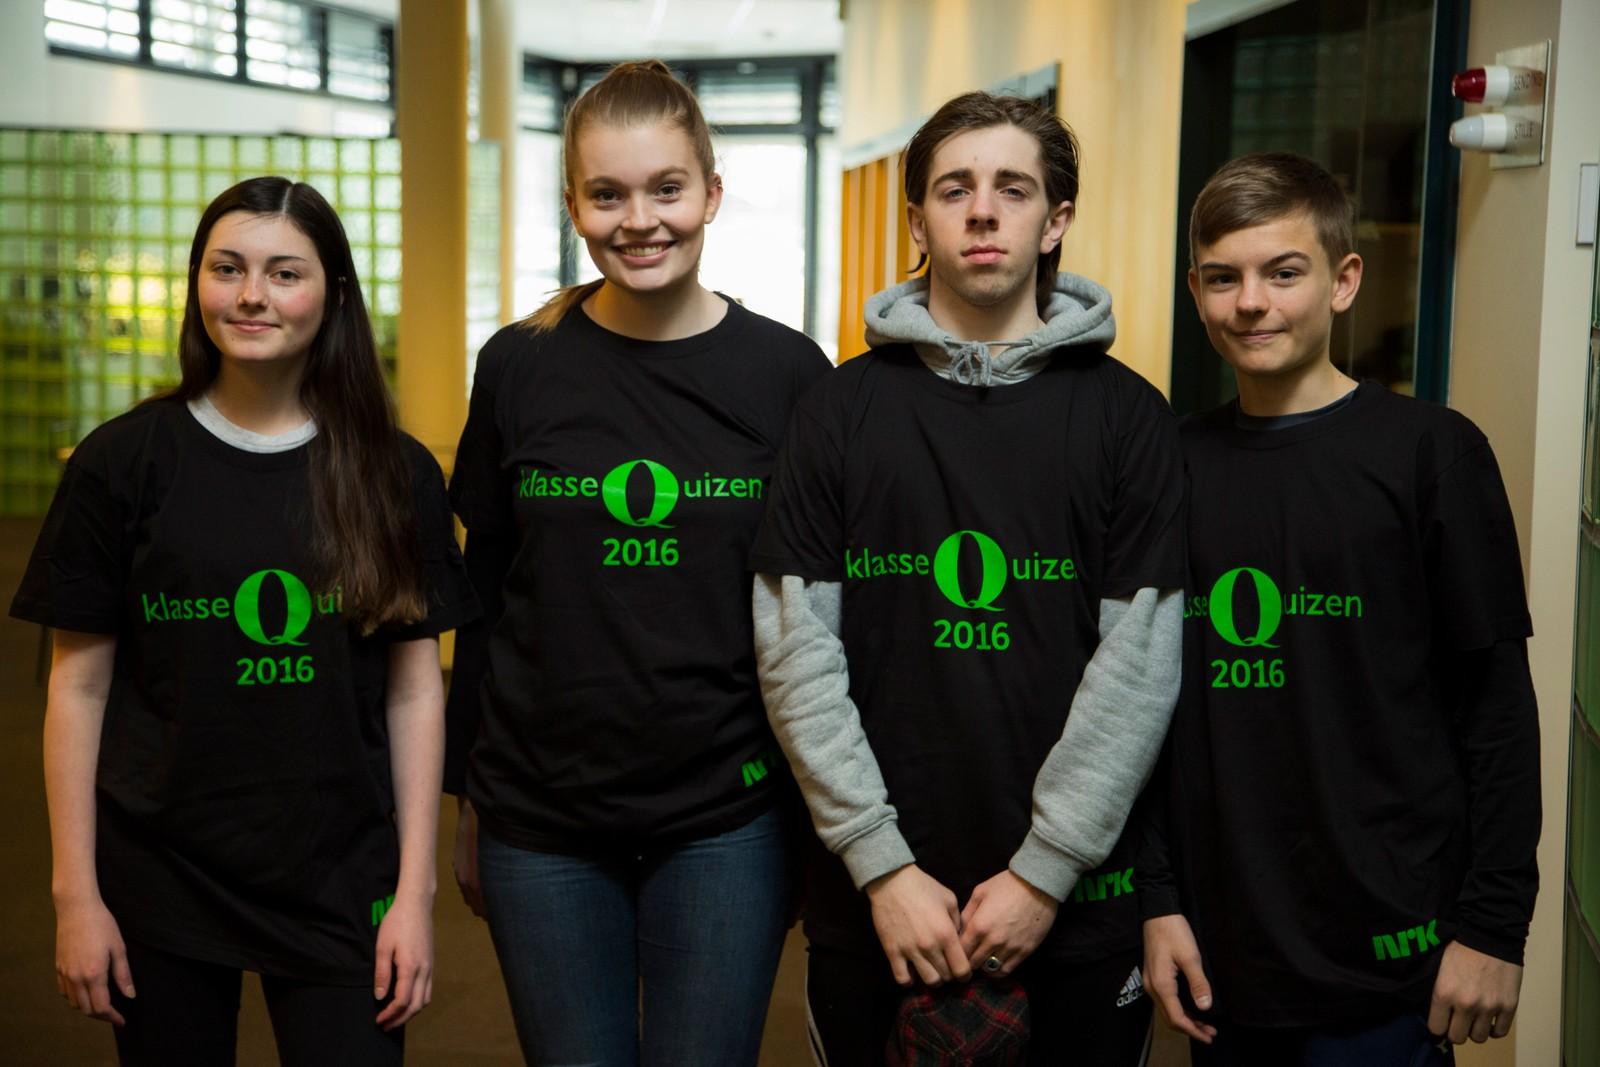 8 POENG: Hinna ungdomsskole: Alexandra Holmes, Trude Smistad (reserve), Adrian Schwerdt og Eskil Oftebro Enge.